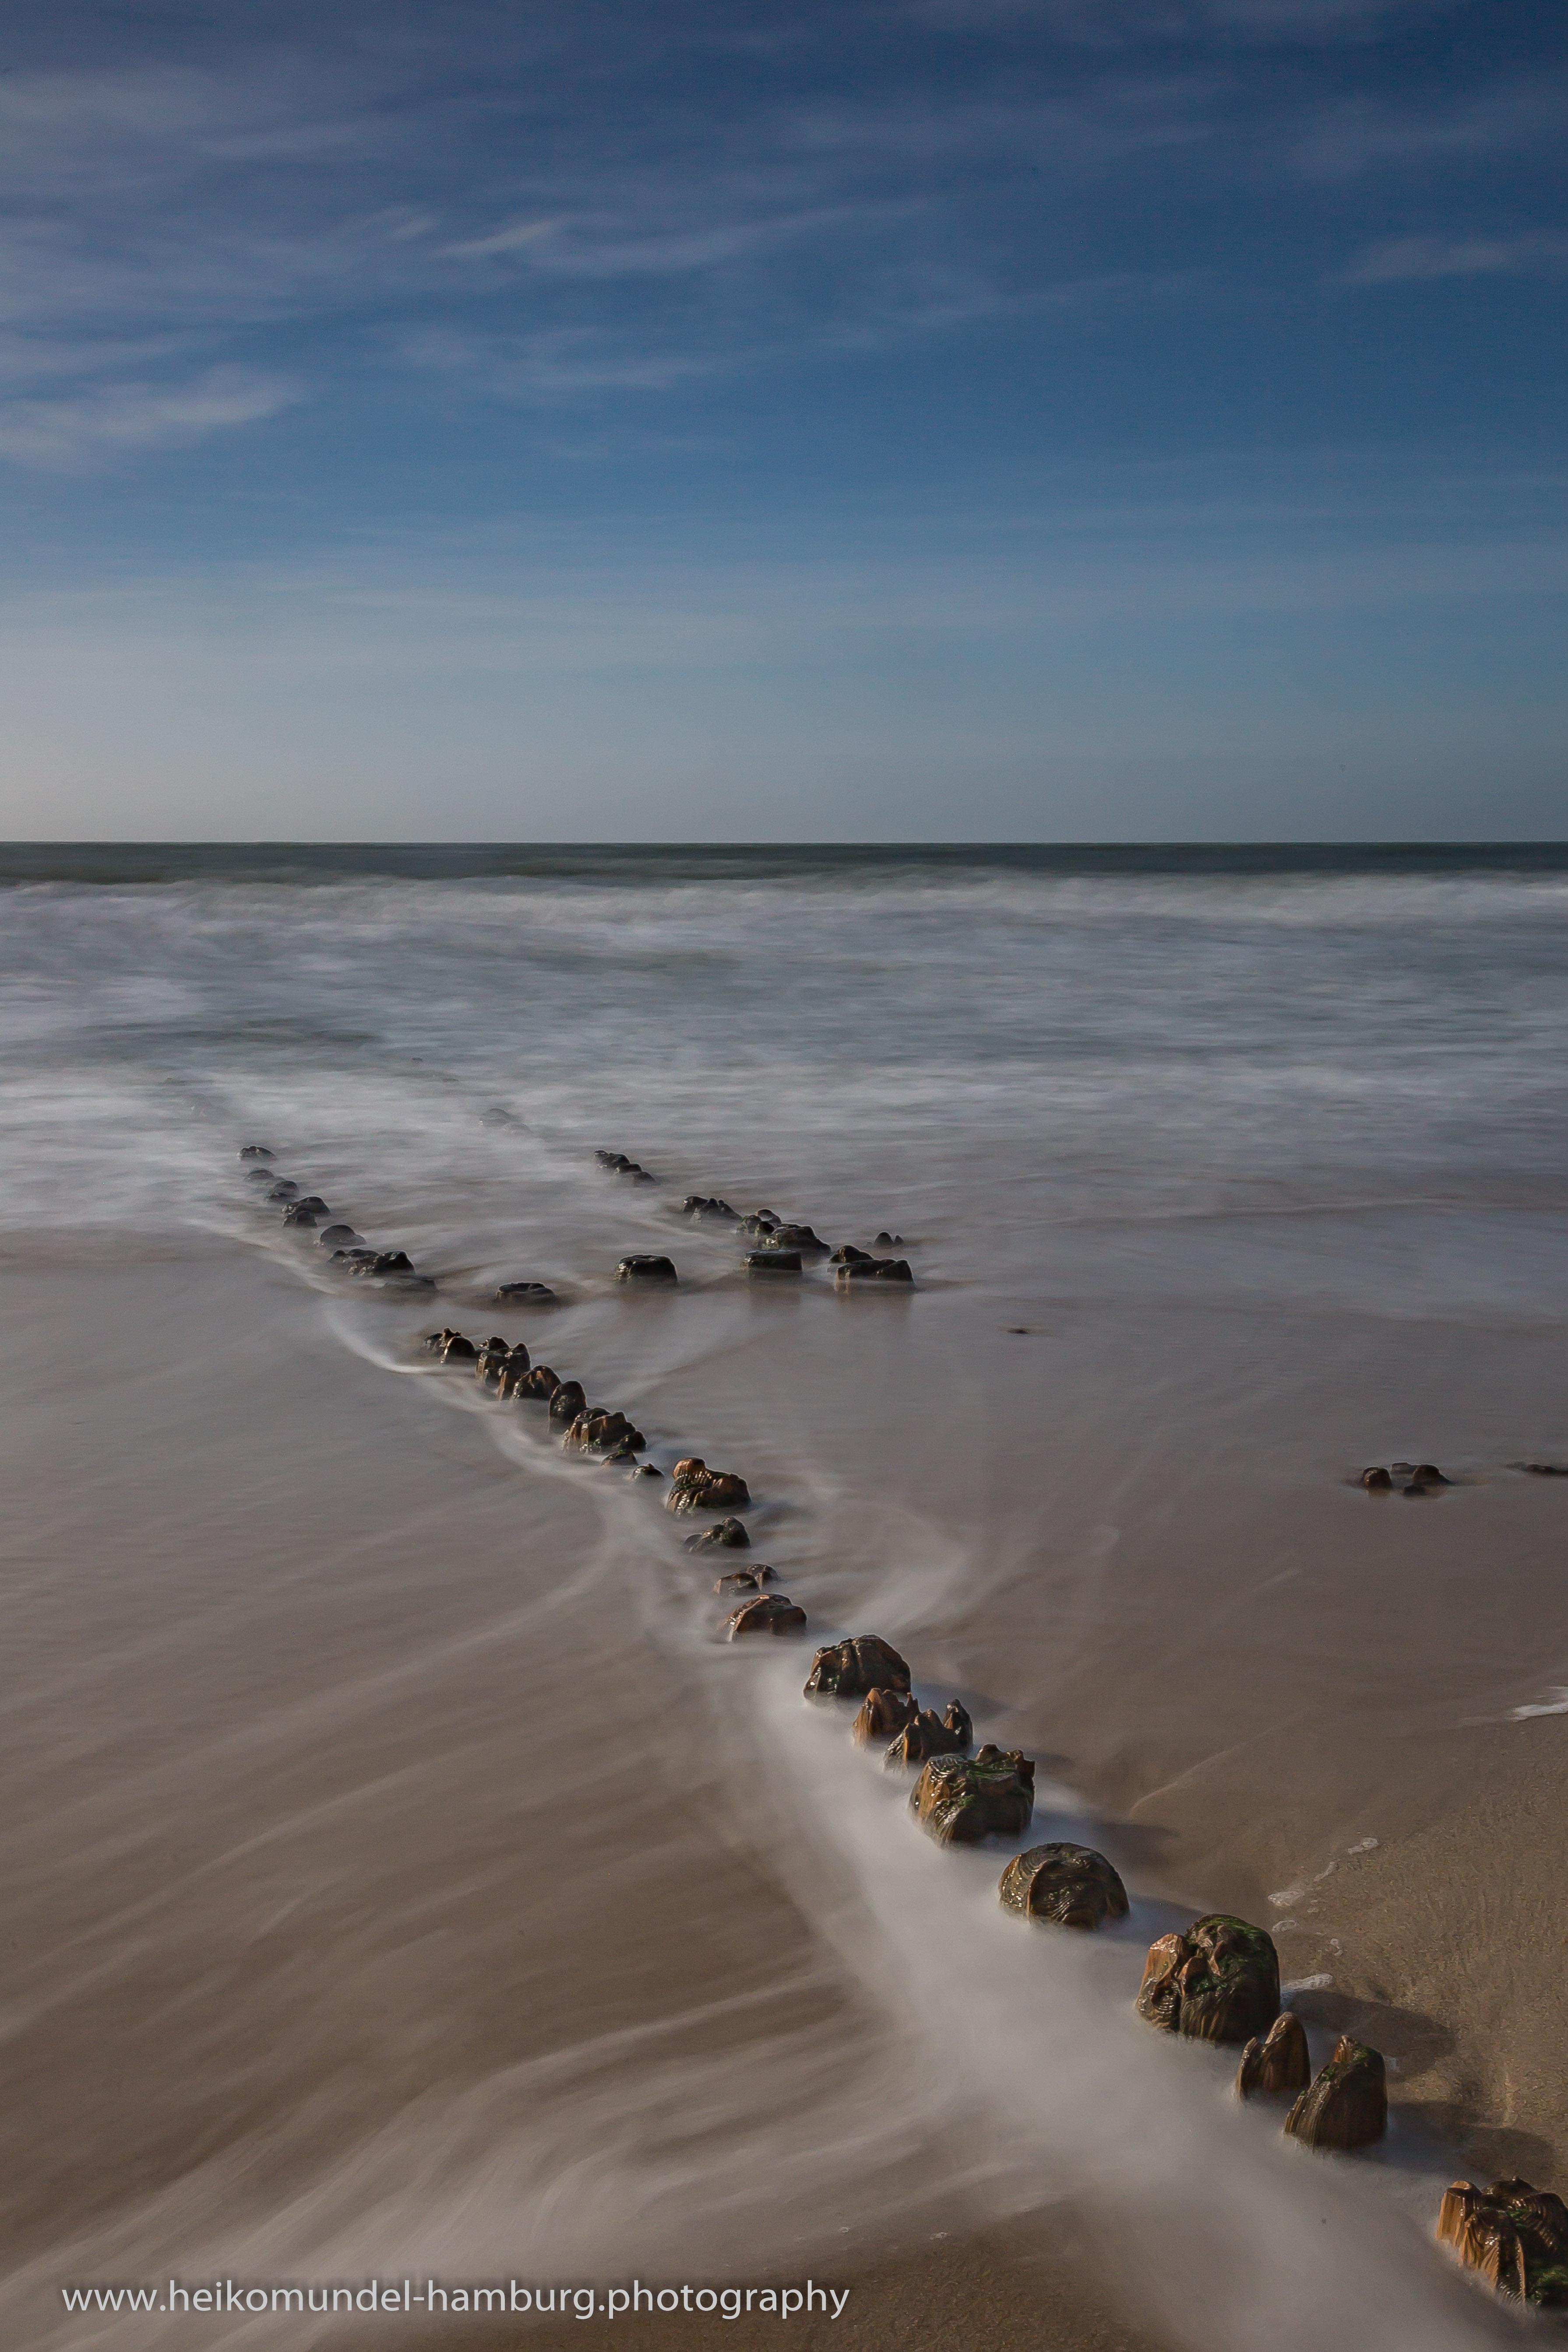 Buhne am Strand